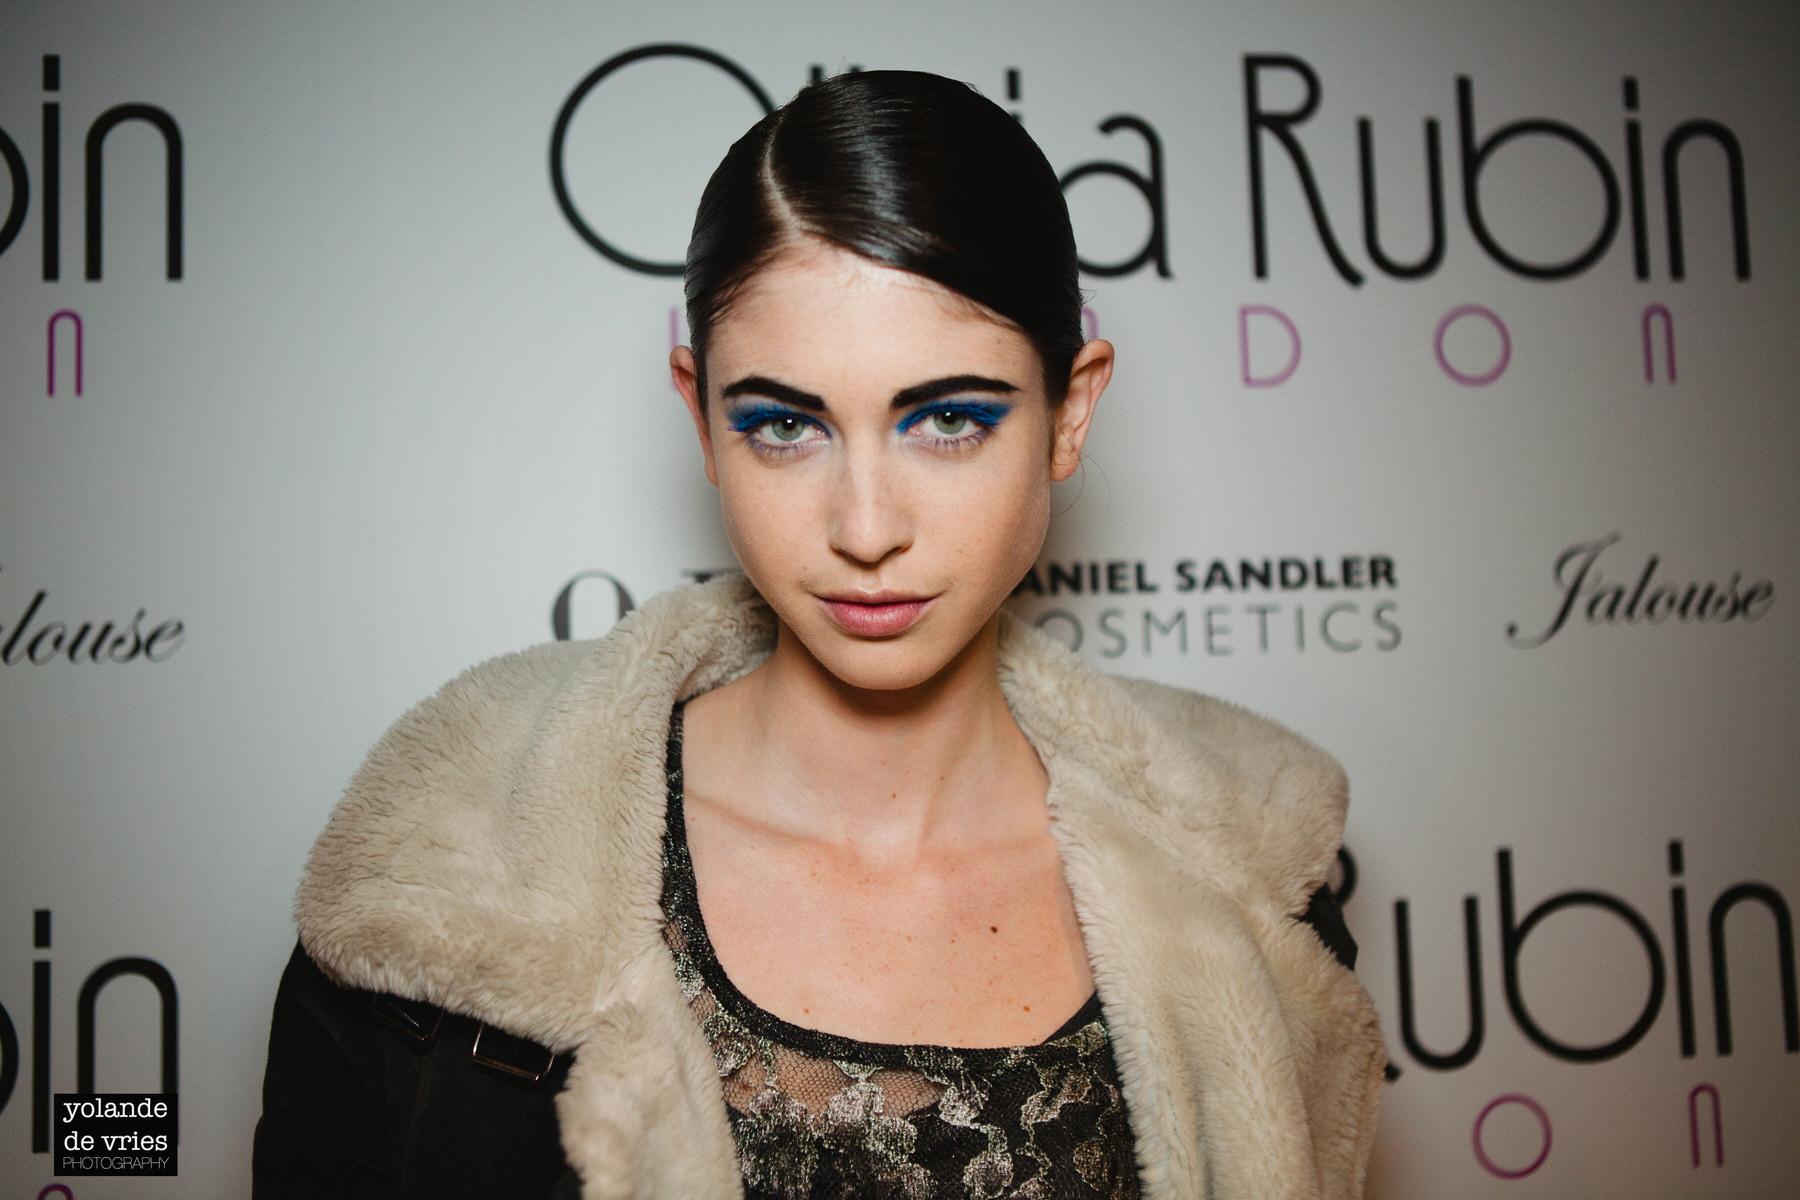 Olivia-Rubin-SS11-London-Fashion-Week-1419.jpg